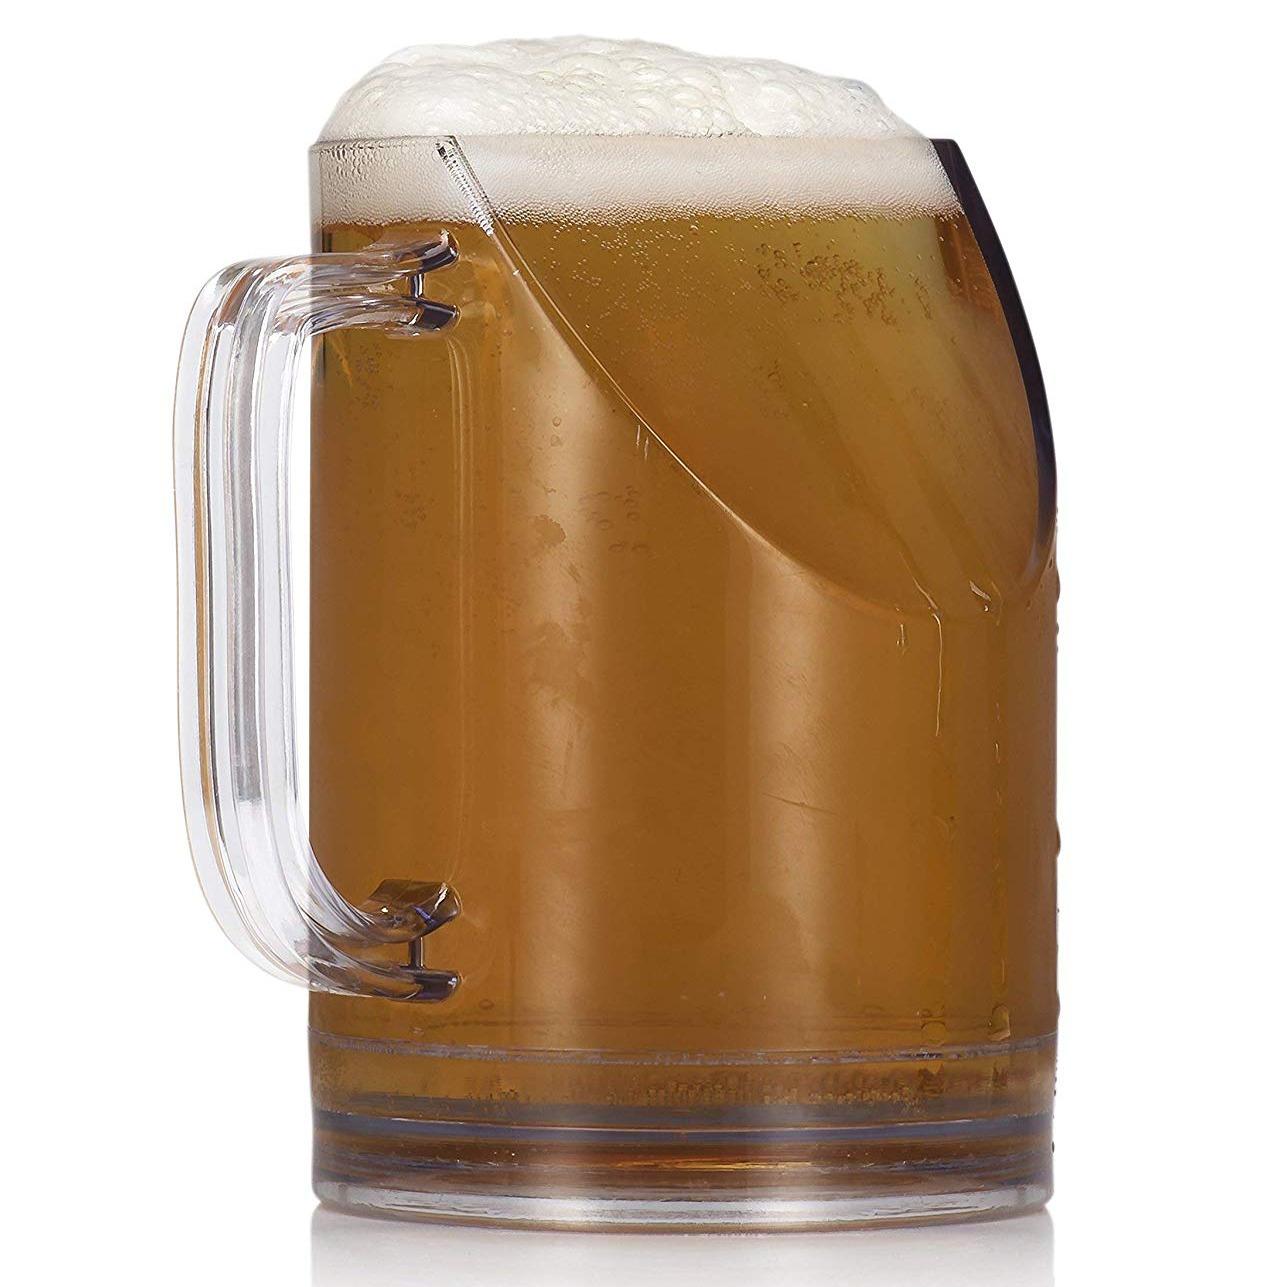 TV Compatible Beer Mug